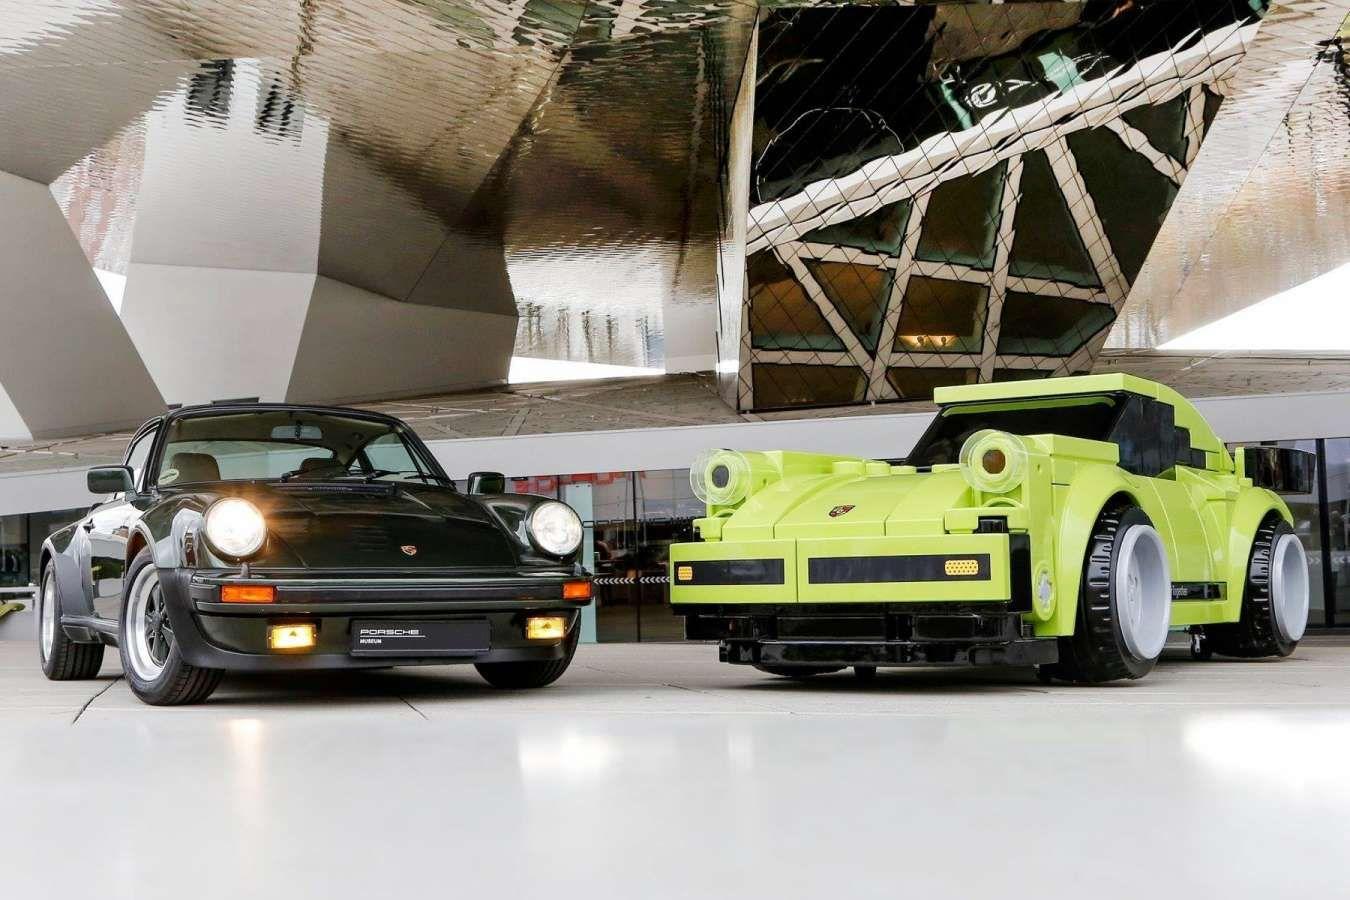 Porsche Build Full Size 930 Turbo Out Of Lego Porsche